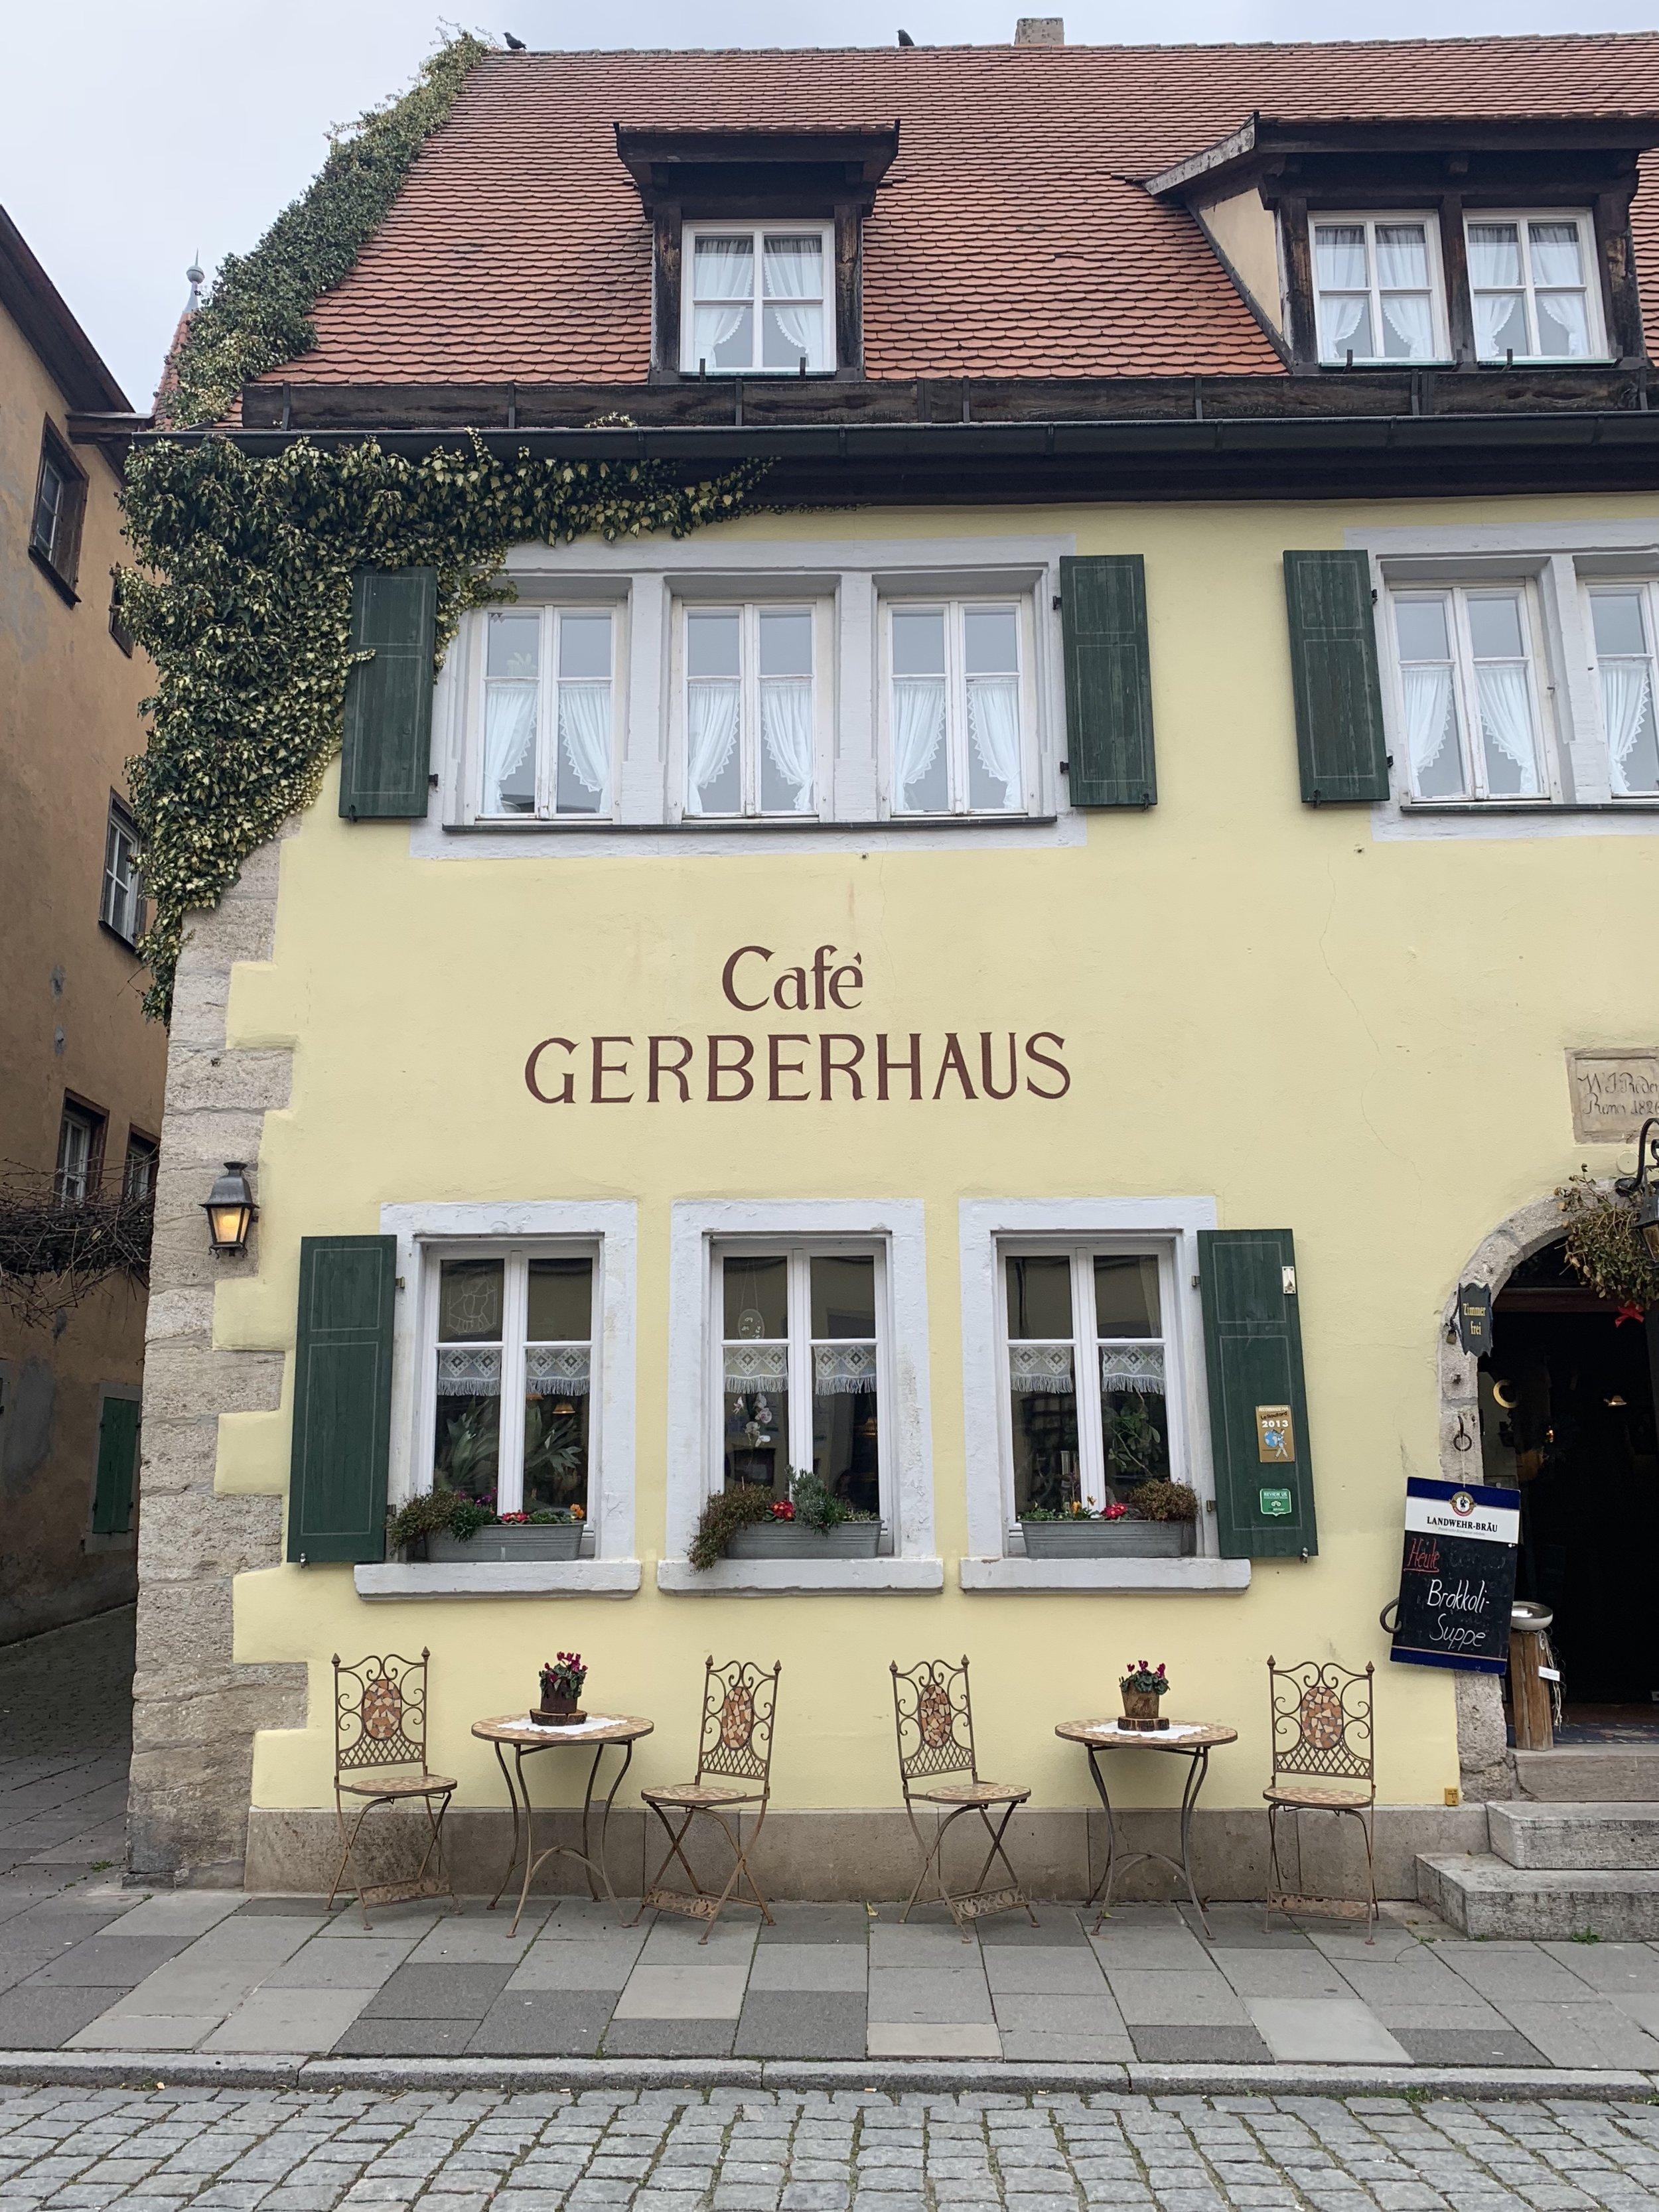 Cafe Gerberhaus Rothenburg ob der Tauber.jpg